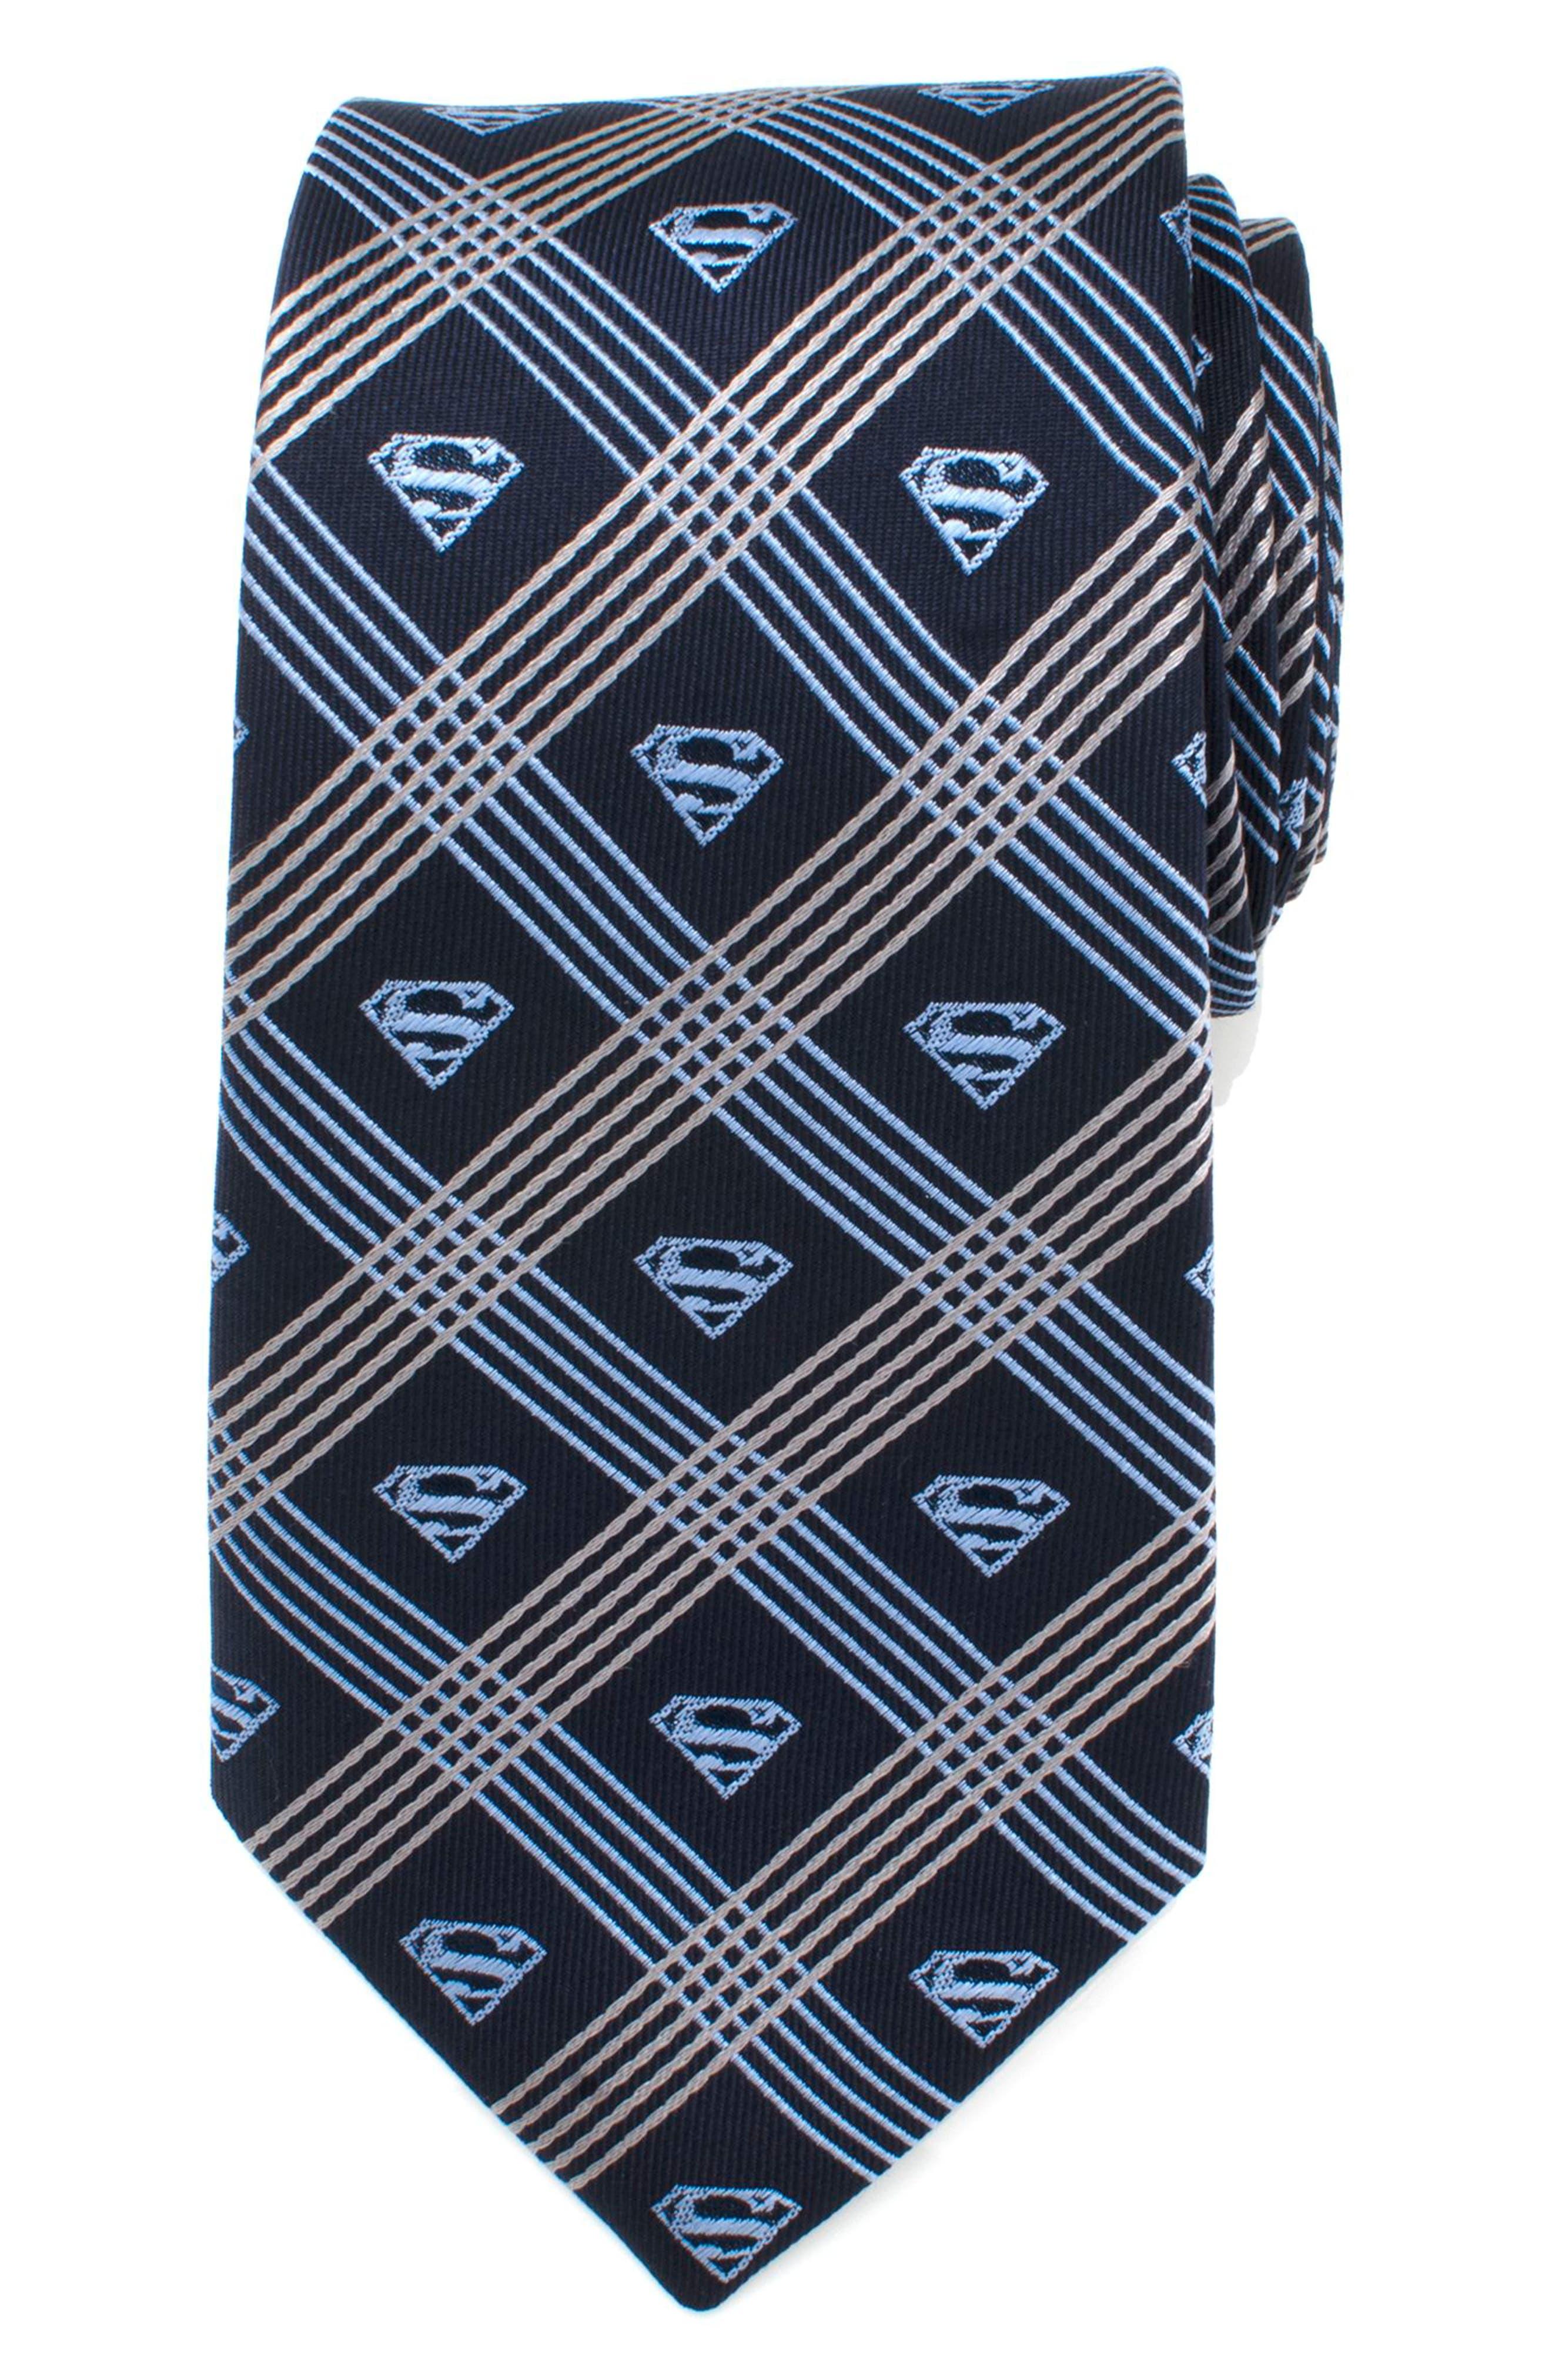 Superman Shield Silk Tie,                             Main thumbnail 1, color,                             Grey/ Navy